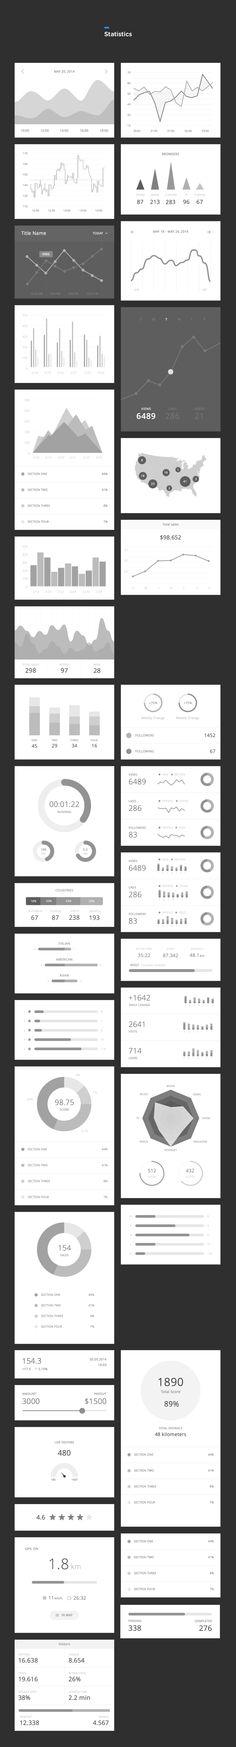 Statistics UX Framework